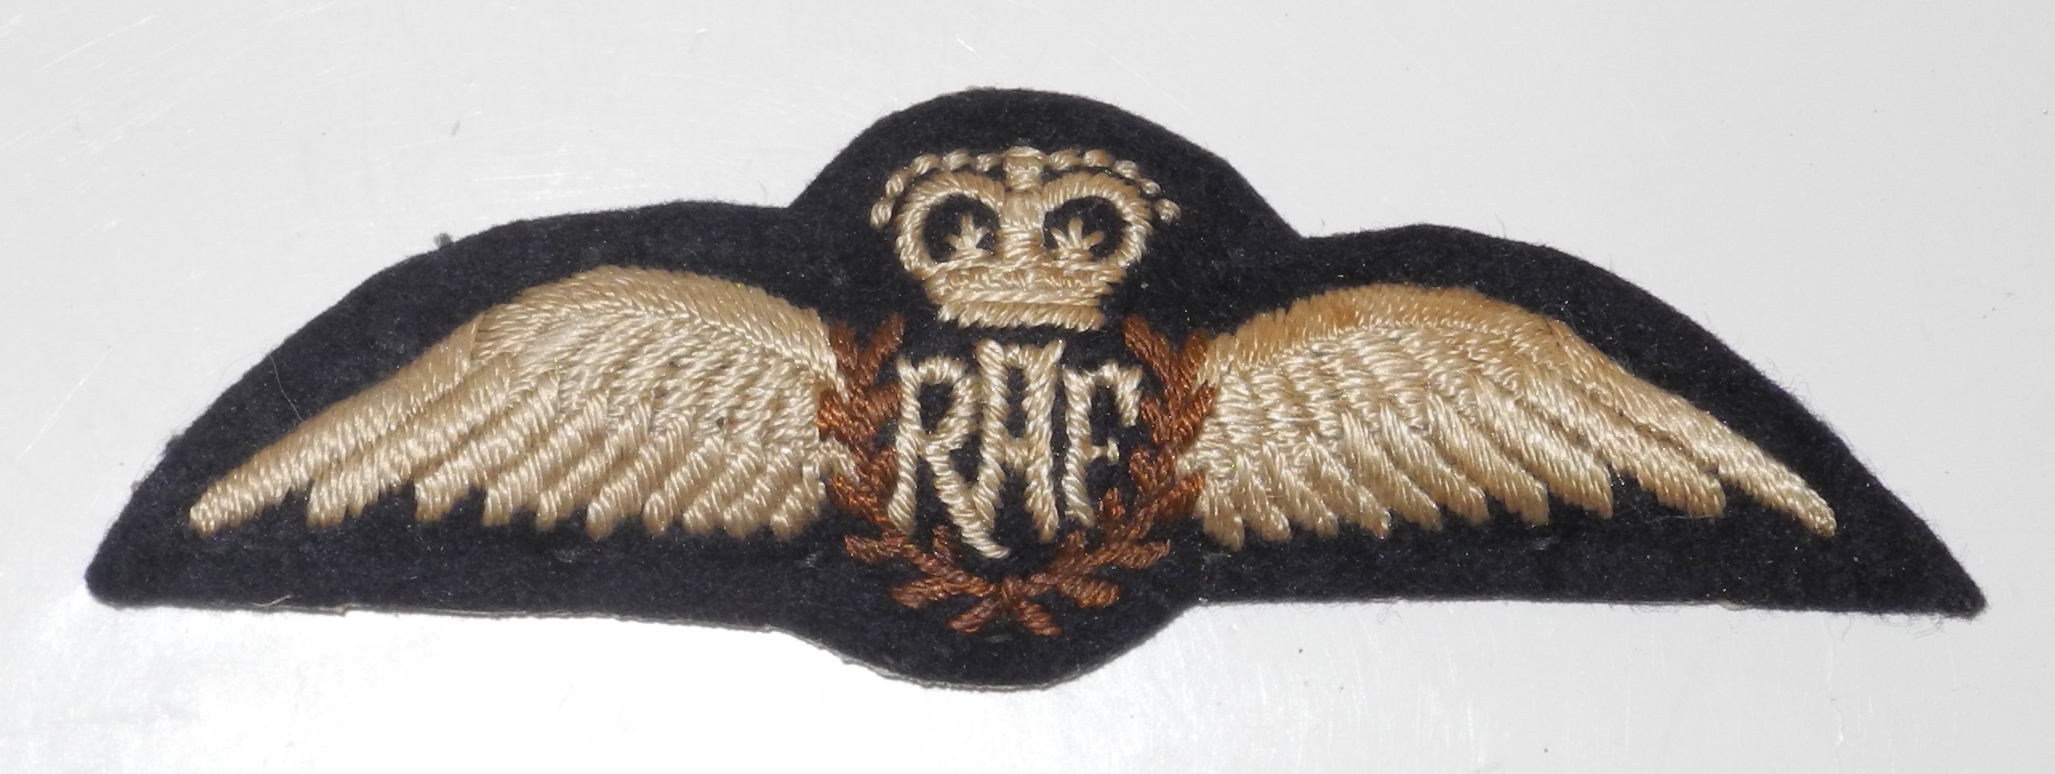 Early post-war RAF pilot wing